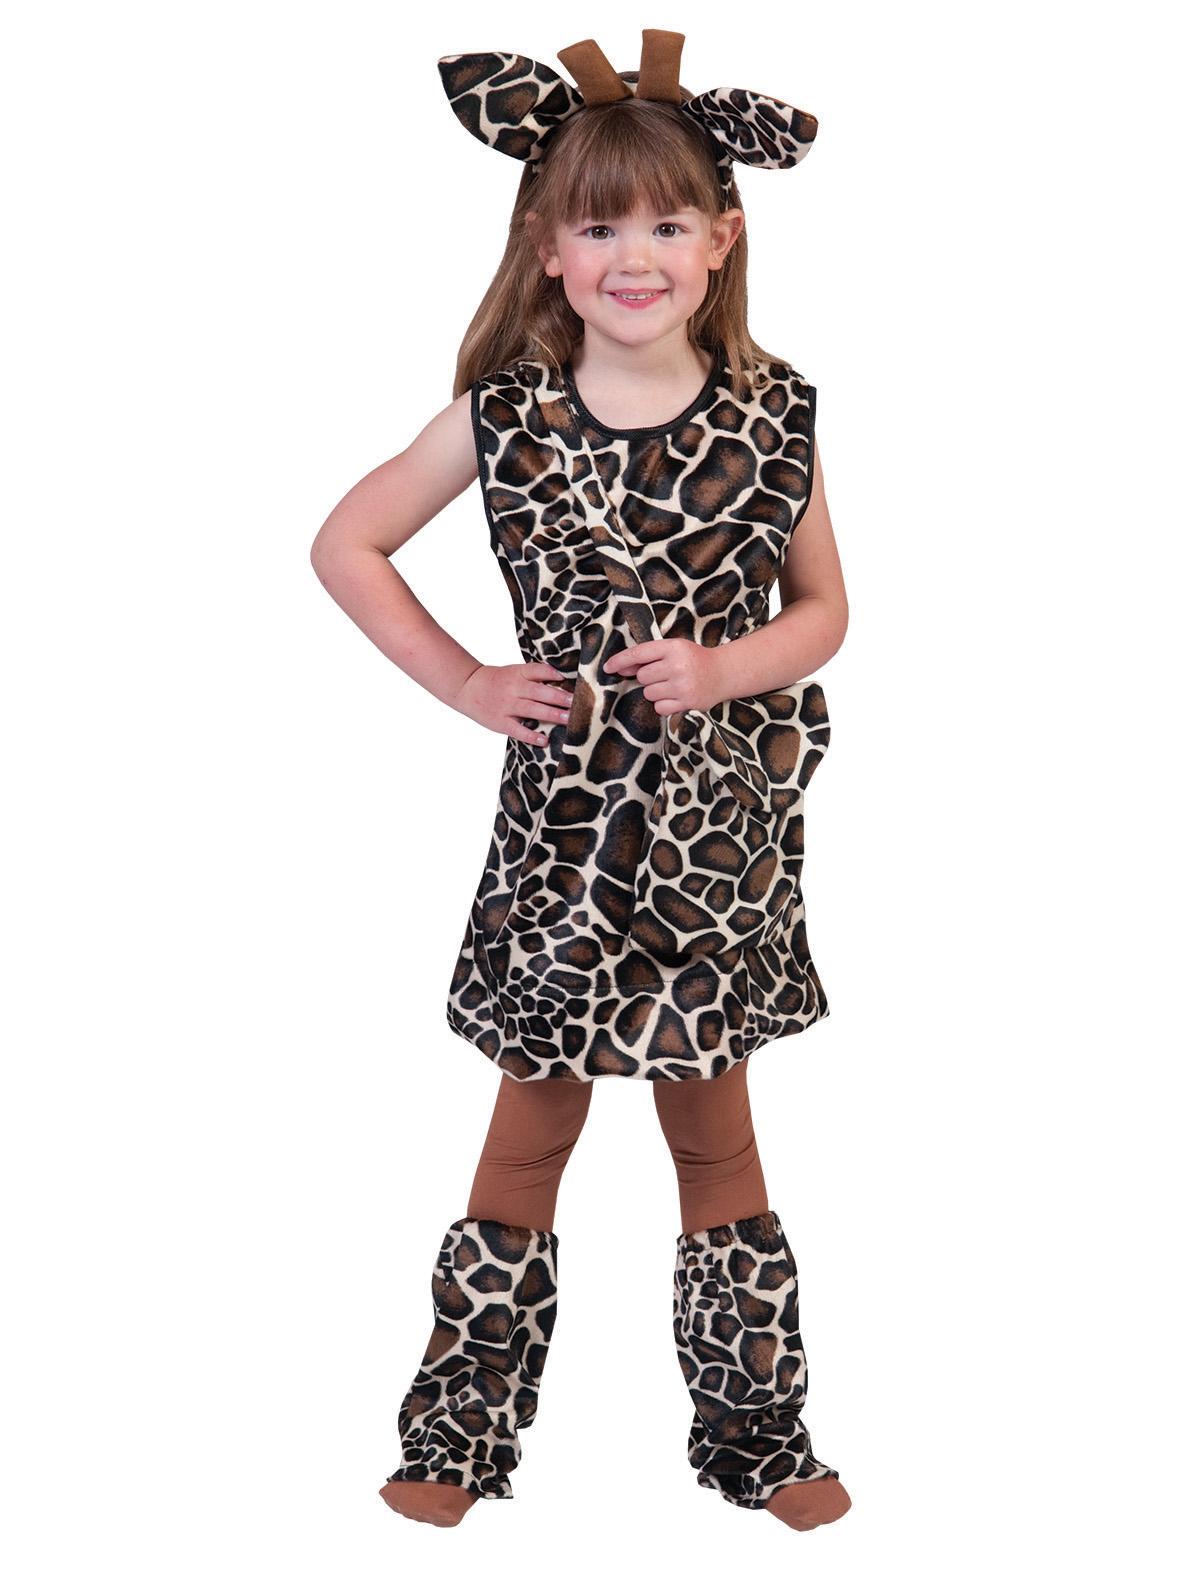 Karneval Kostueme Fasching Dschungel Tiere Kleid Giraffe Kind1X30Zi5EklK6dZ3TSOesJmBBdhc